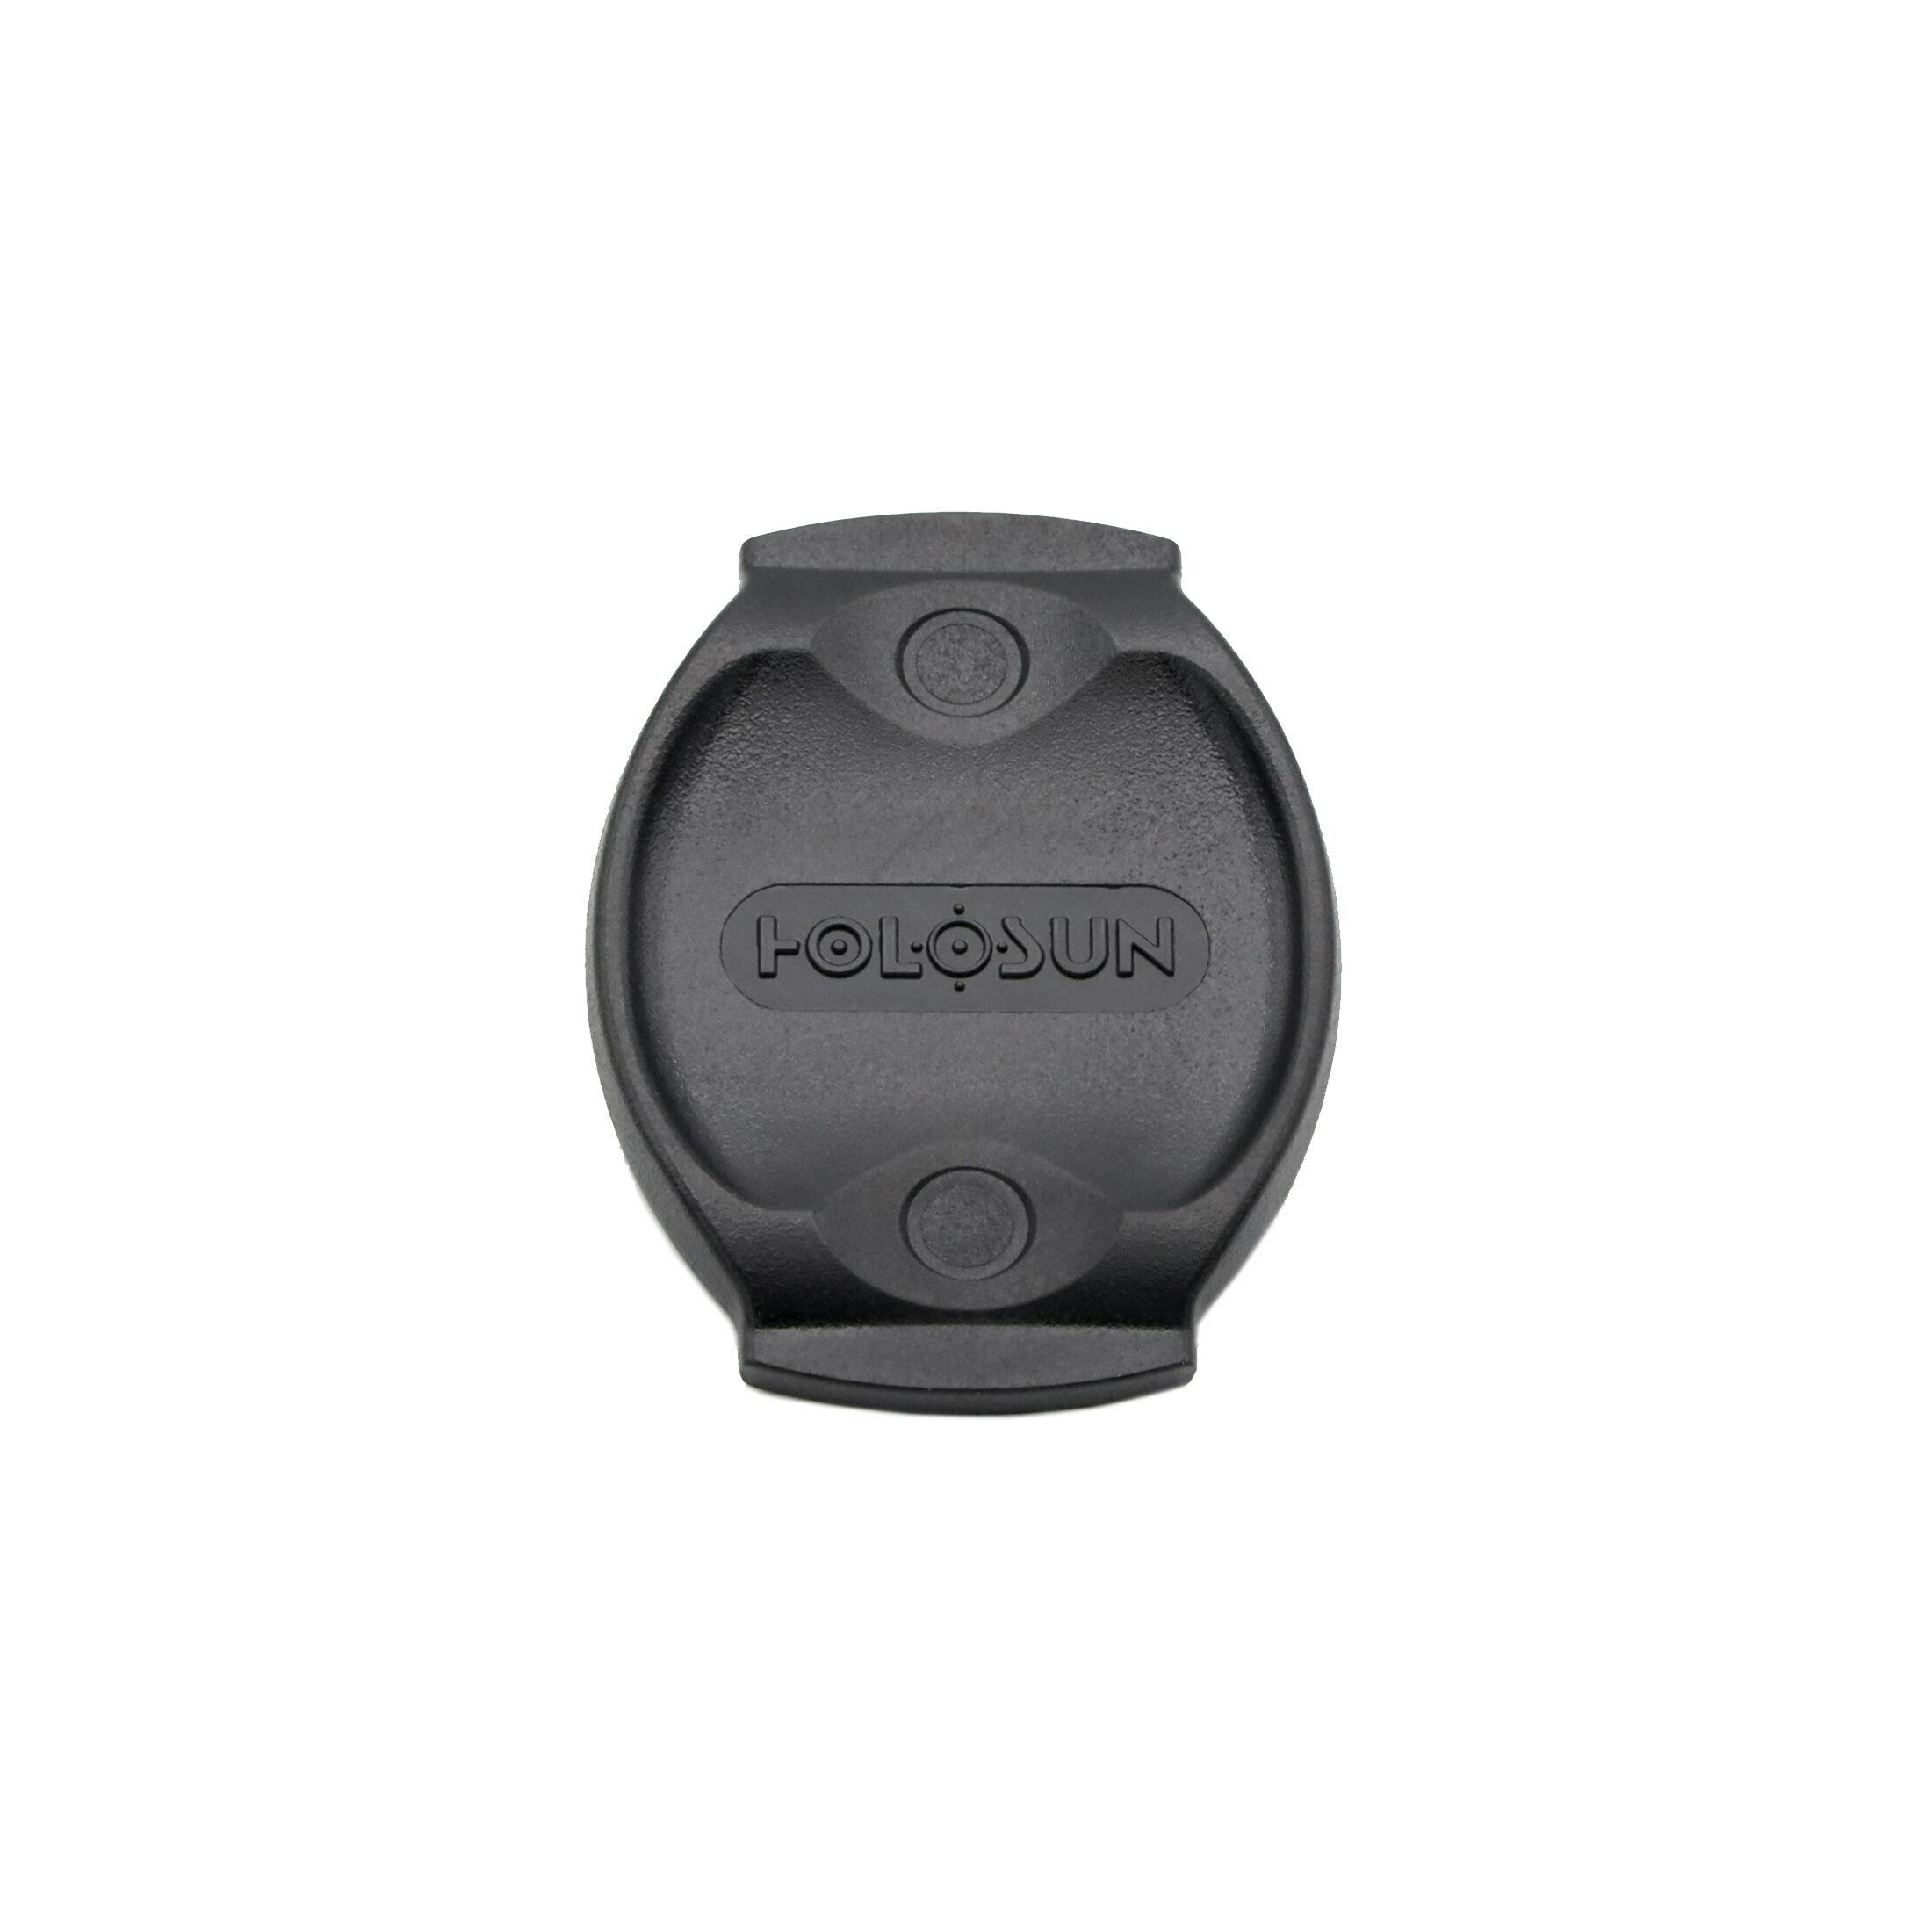 Holosun accessory CLASSIC BATTERIEFACH-TOOL-403R-503R